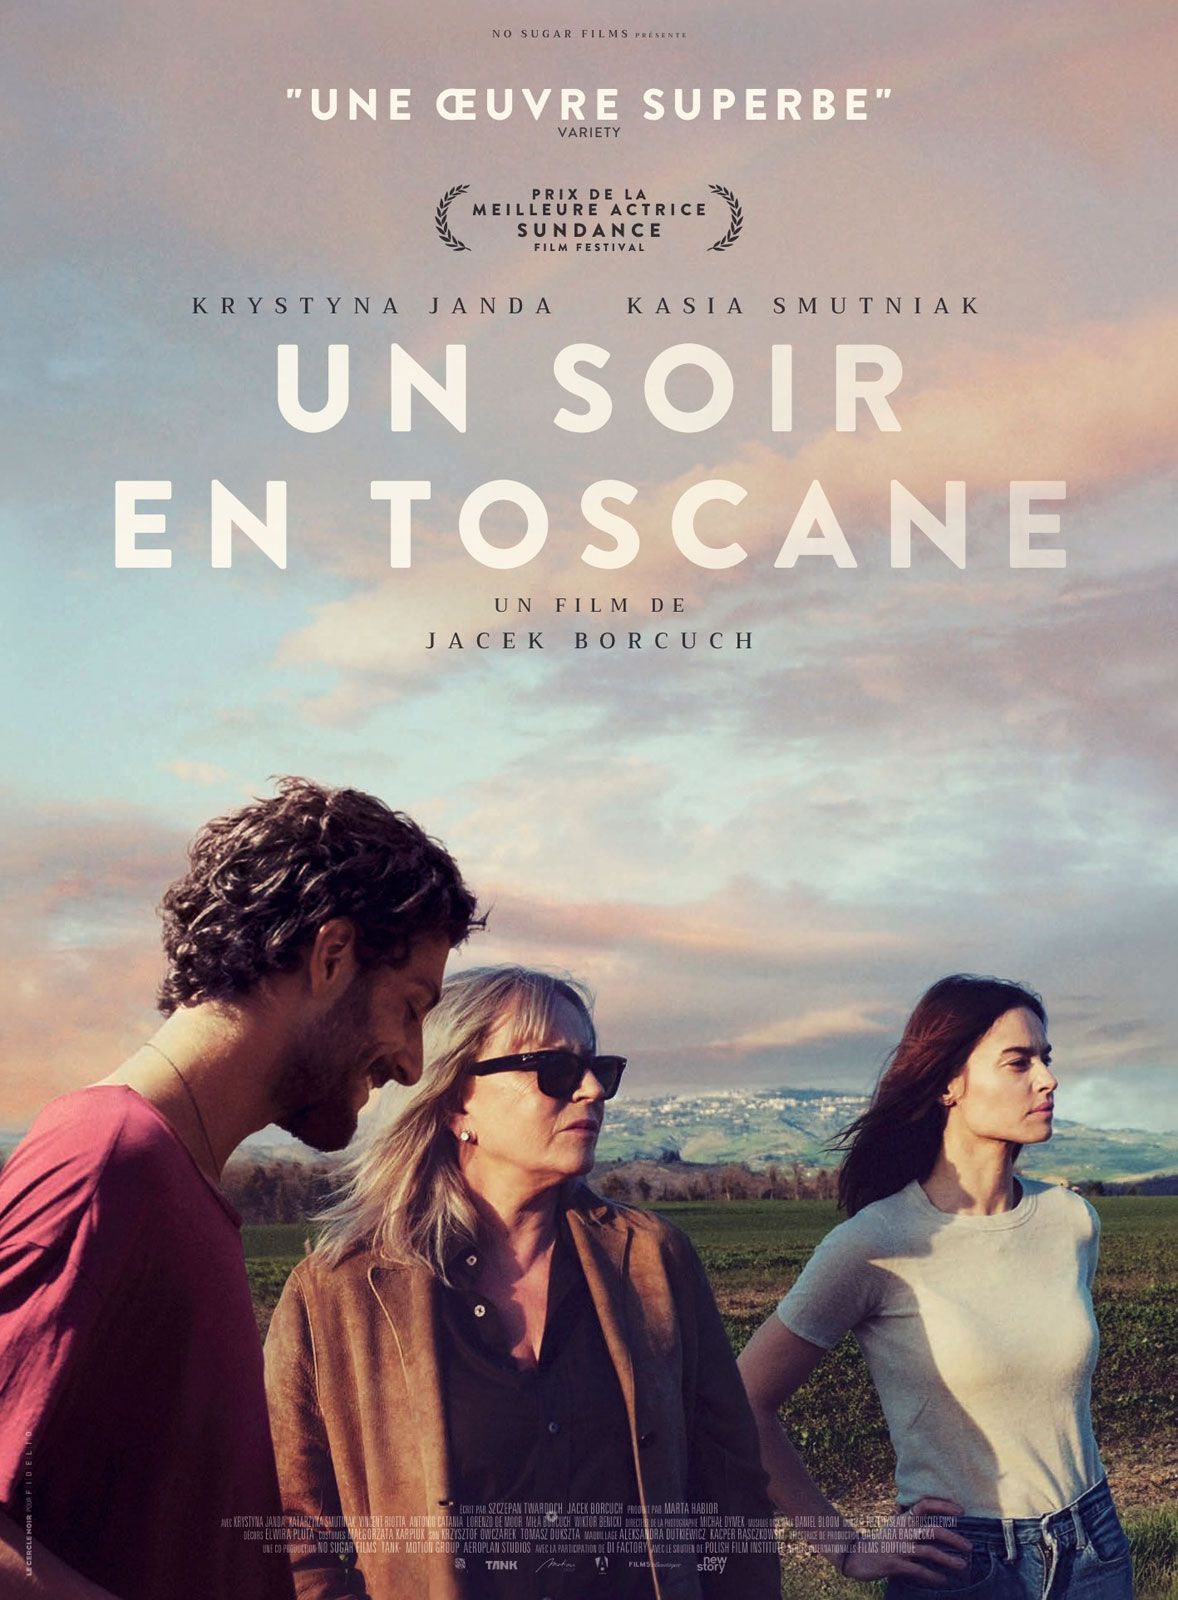 Un soir en Toscane - Film (2020)